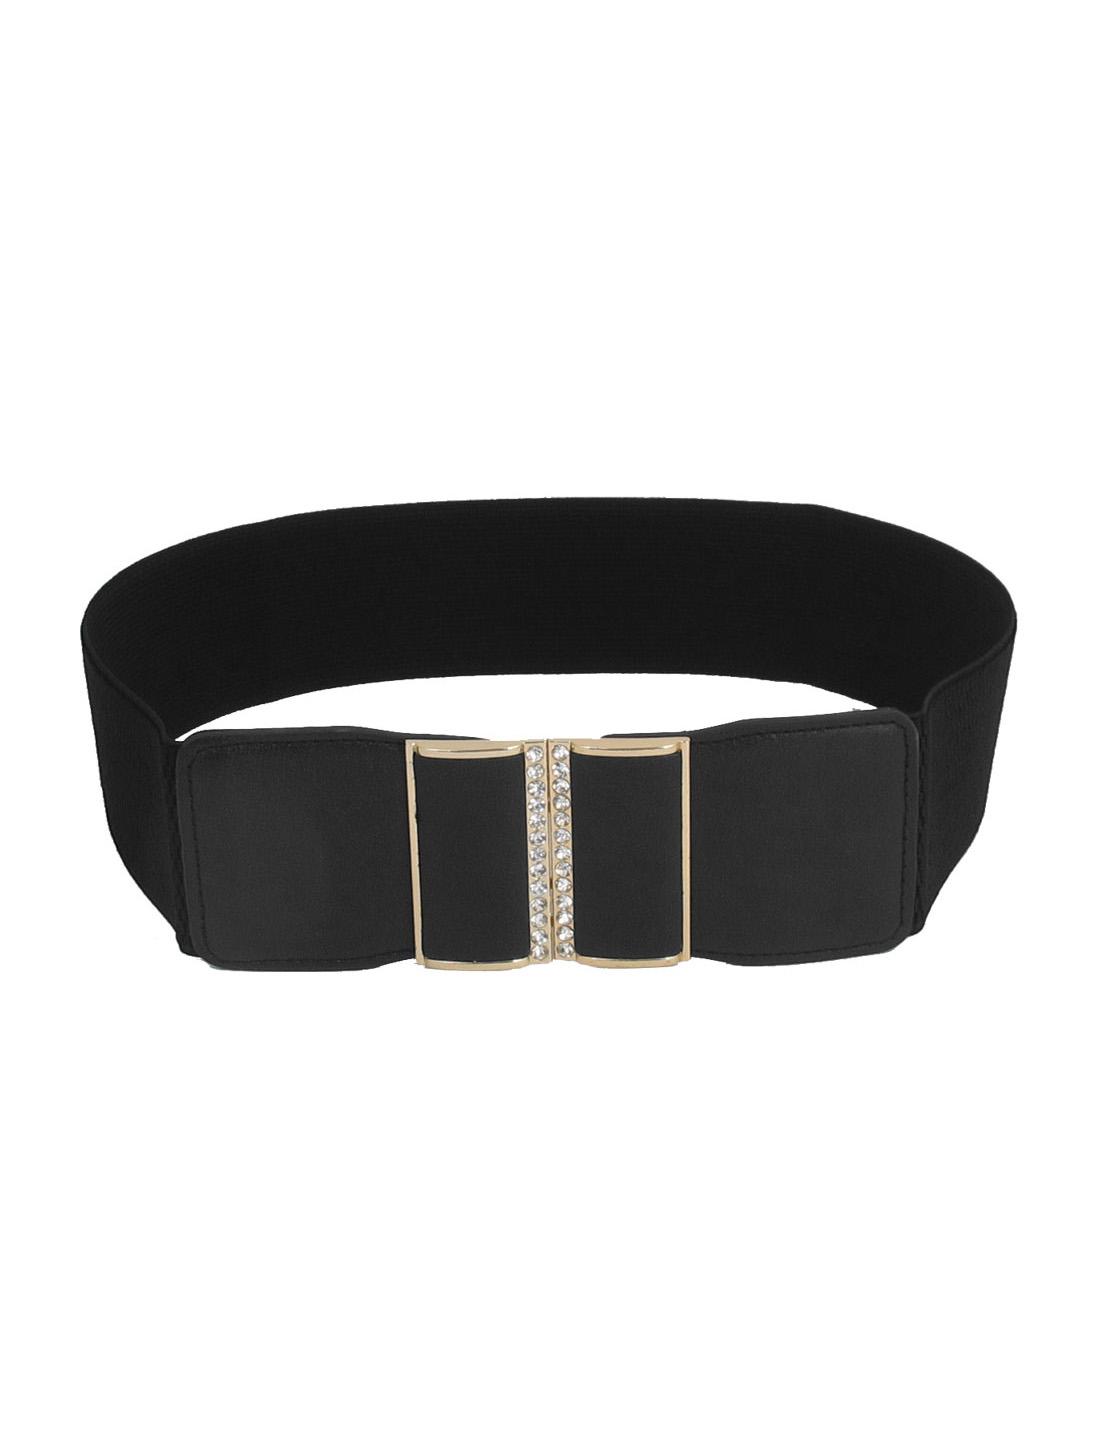 Rhinestone Inlay Interlocking Buckle Stretchy Faux Leather Waist Belt Band Waistband Black